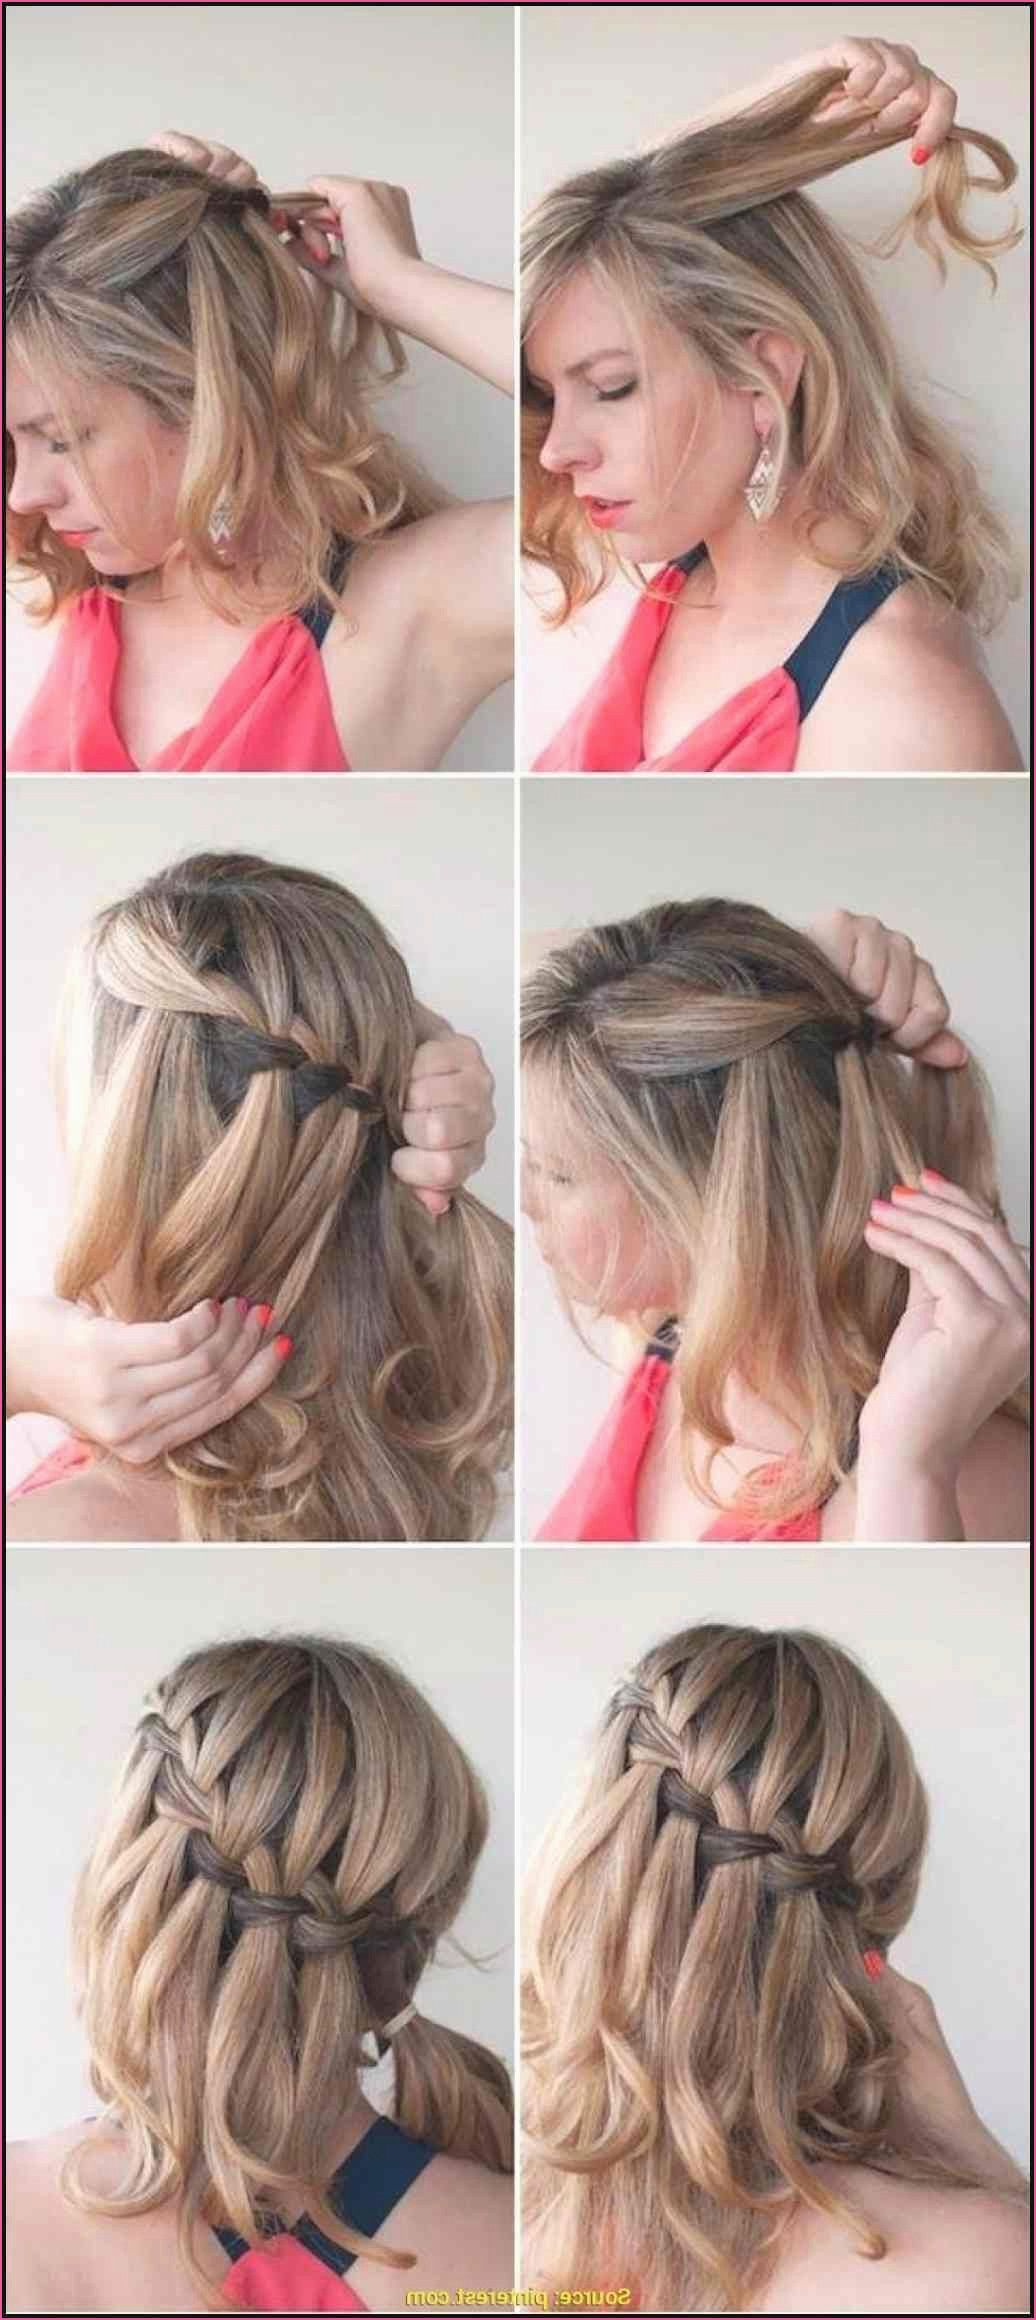 Wiesn Frisuren Mittellange Haare in 8  Dirndl frisuren kurze